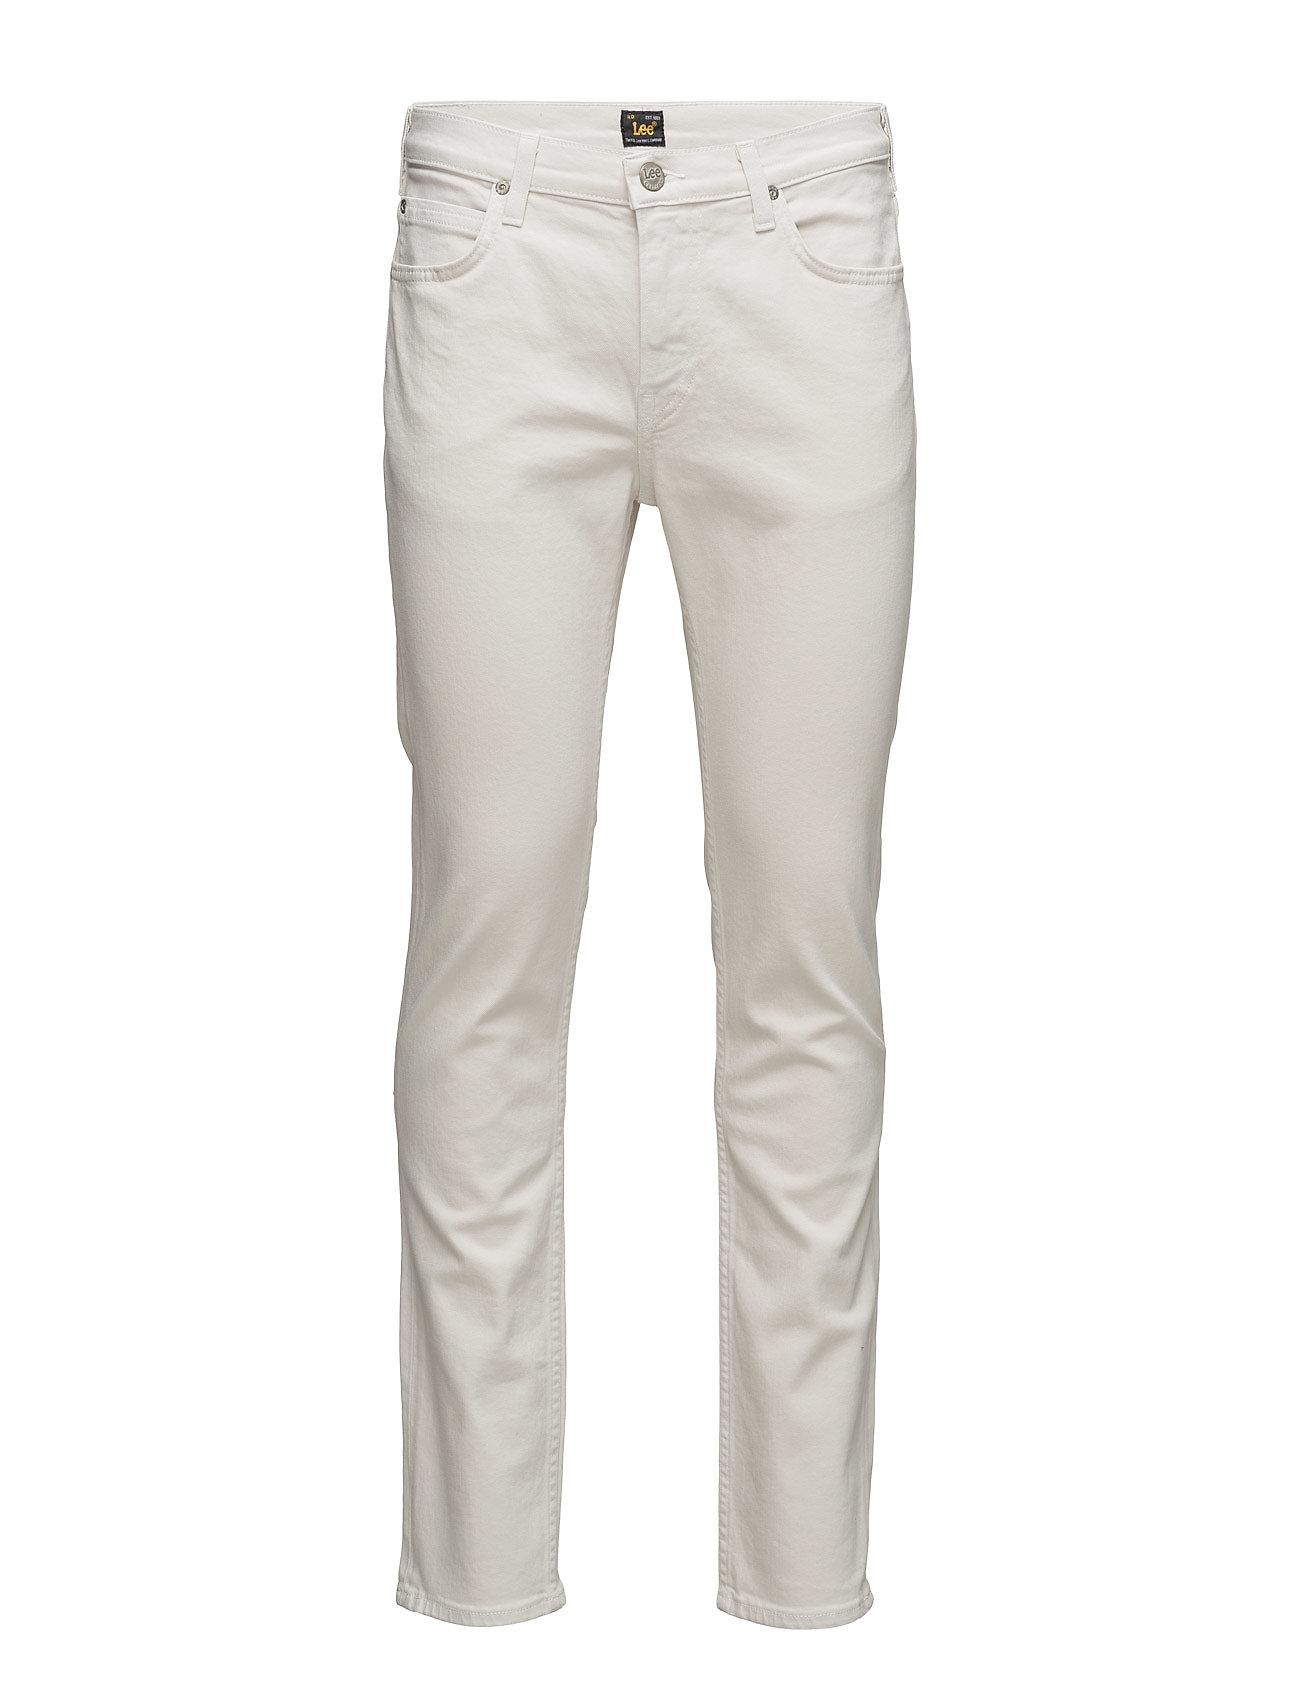 lee jeans Rider off white fra boozt.com dk